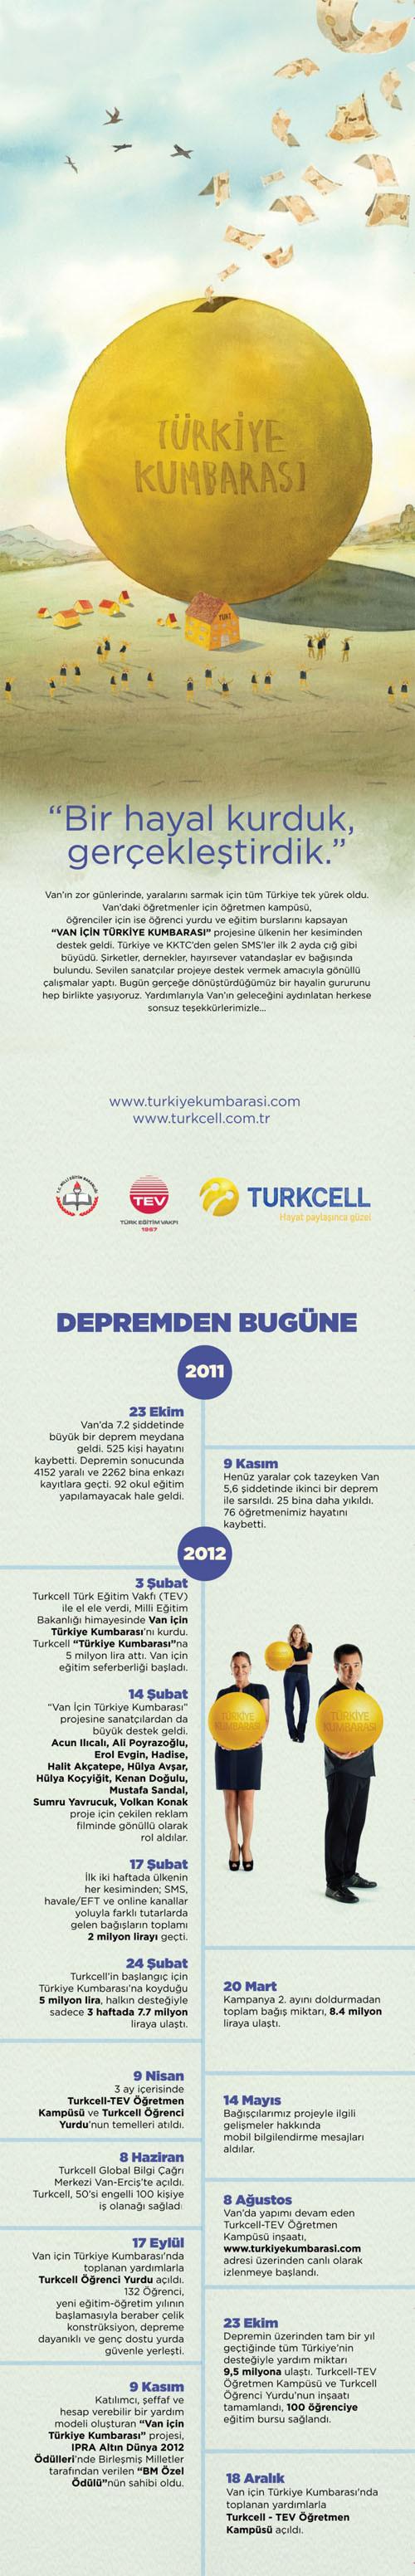 1365152394_depremden-bugune-infografik.jpg